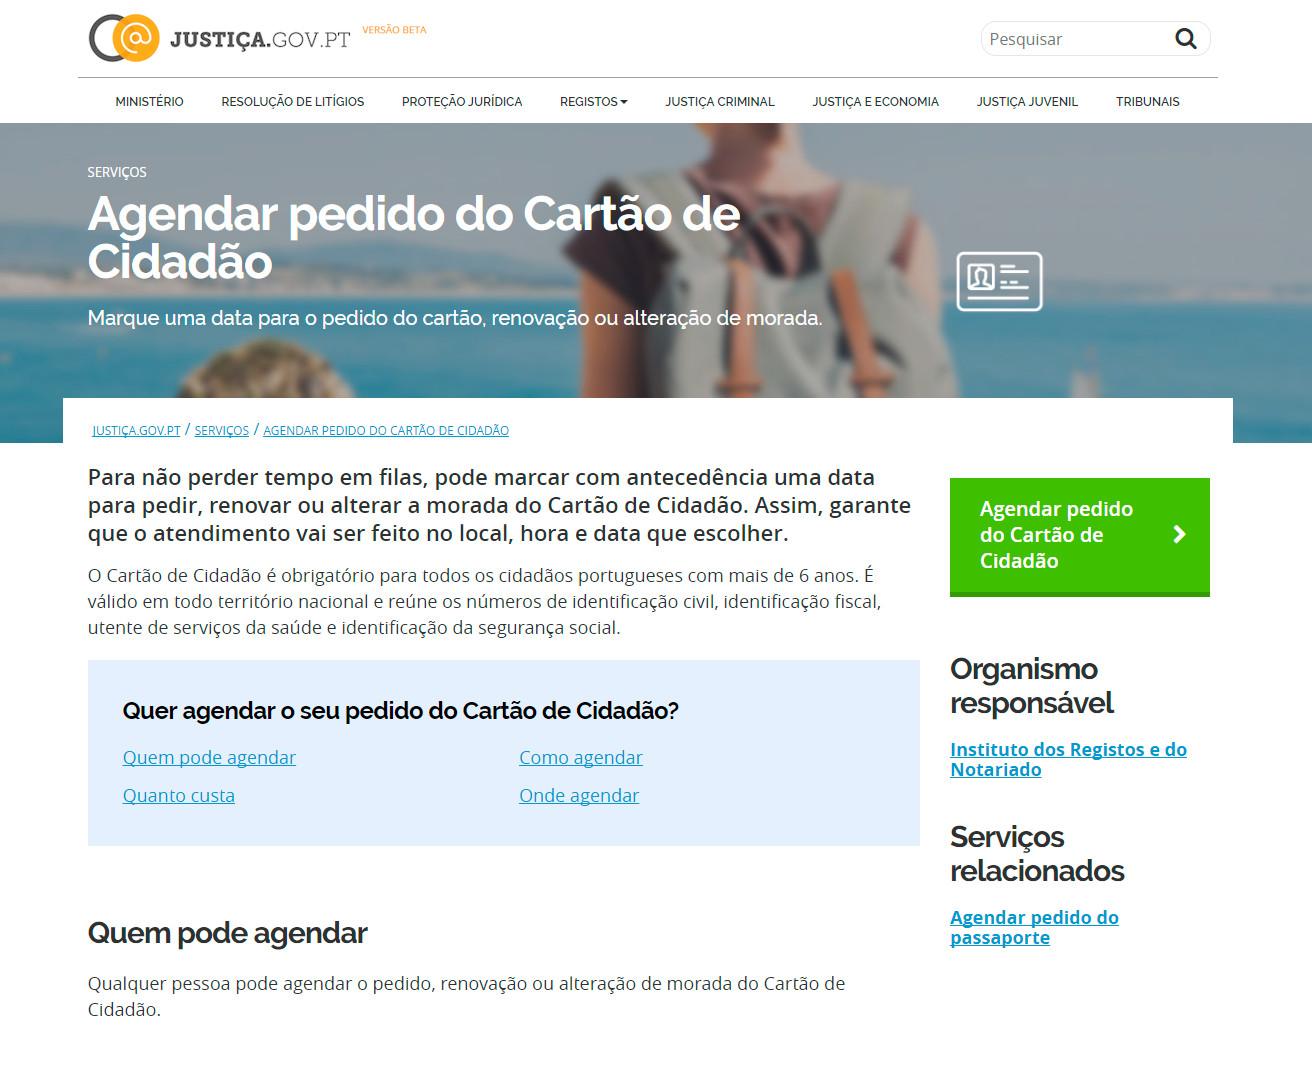 agendas_cartaocidadao.png